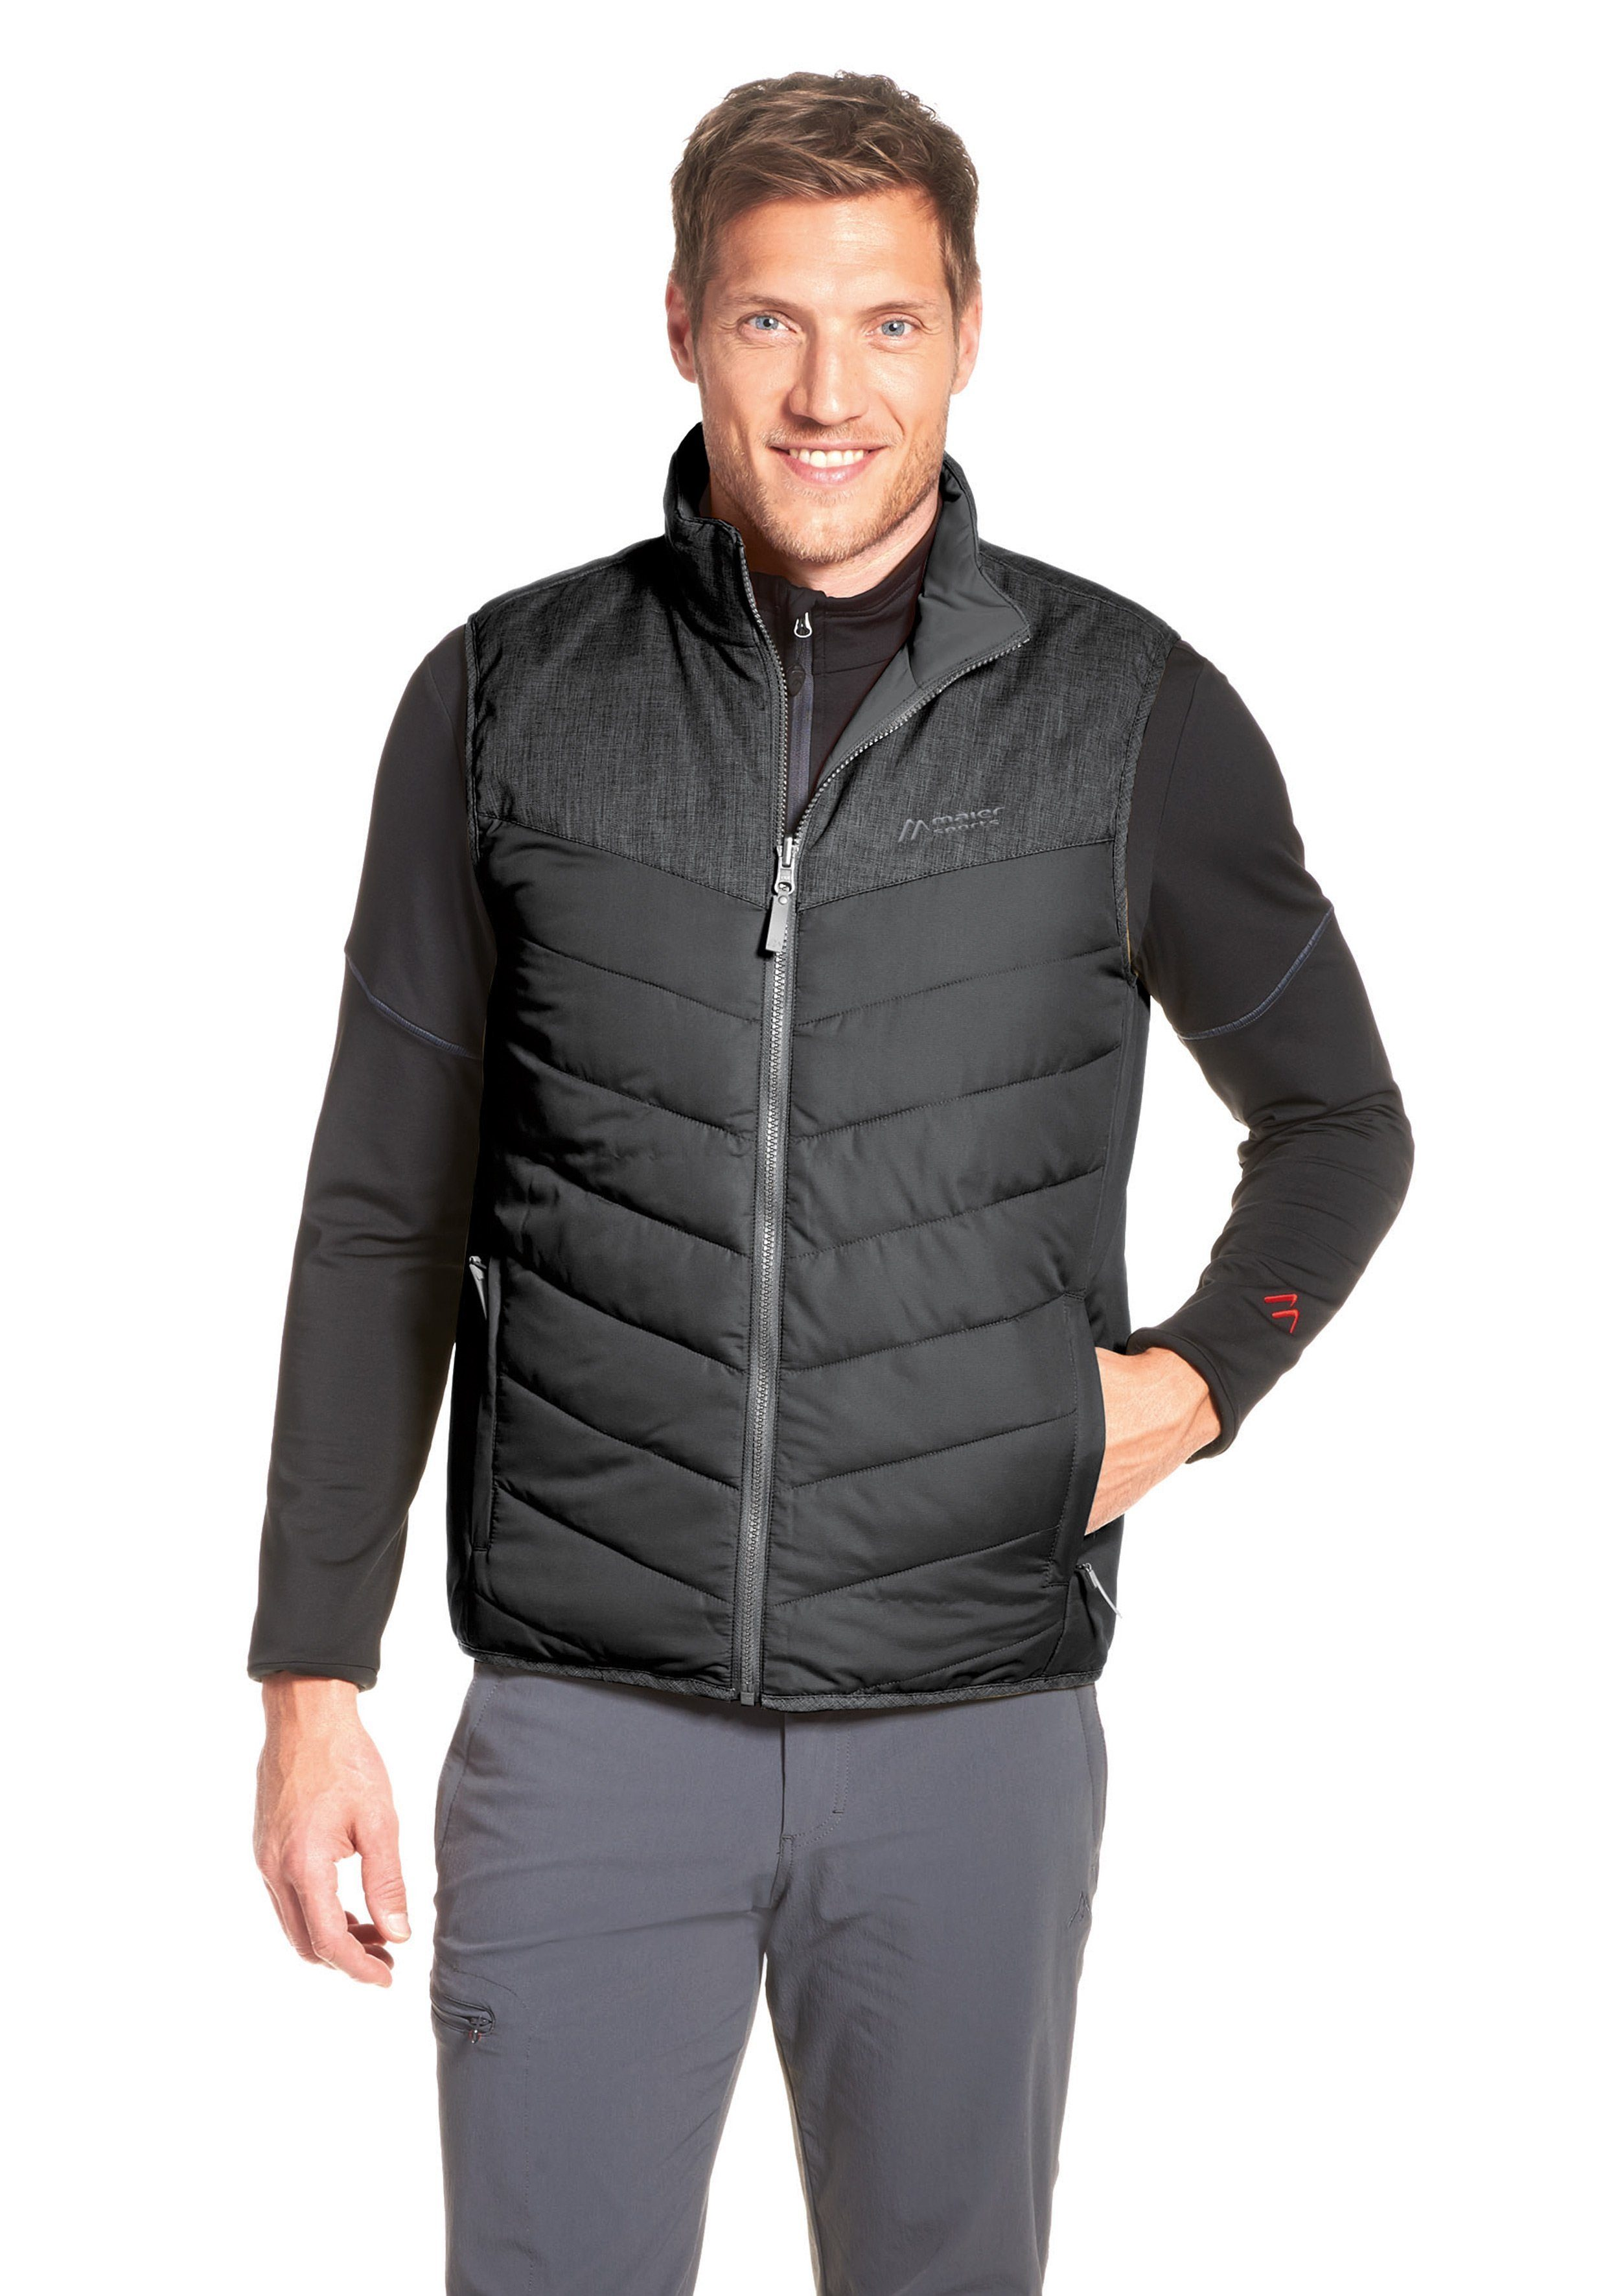 Maier Sports Steppjacke Gero Vest | Sportbekleidung > Sportjacken > Steppjacken | Schwarz | Maier Sports